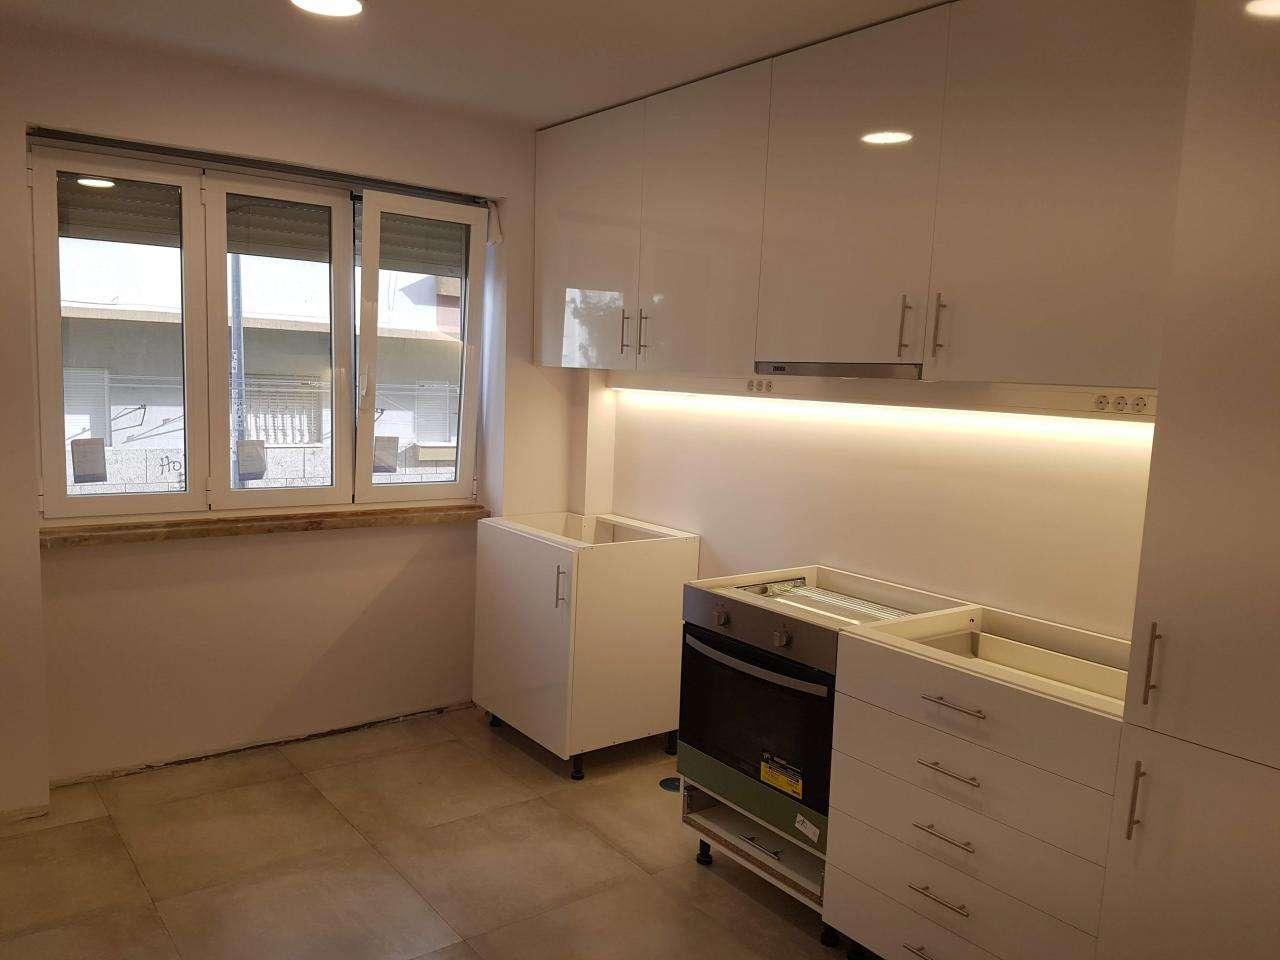 Apartamento para comprar, Queluz e Belas, Lisboa - Foto 7